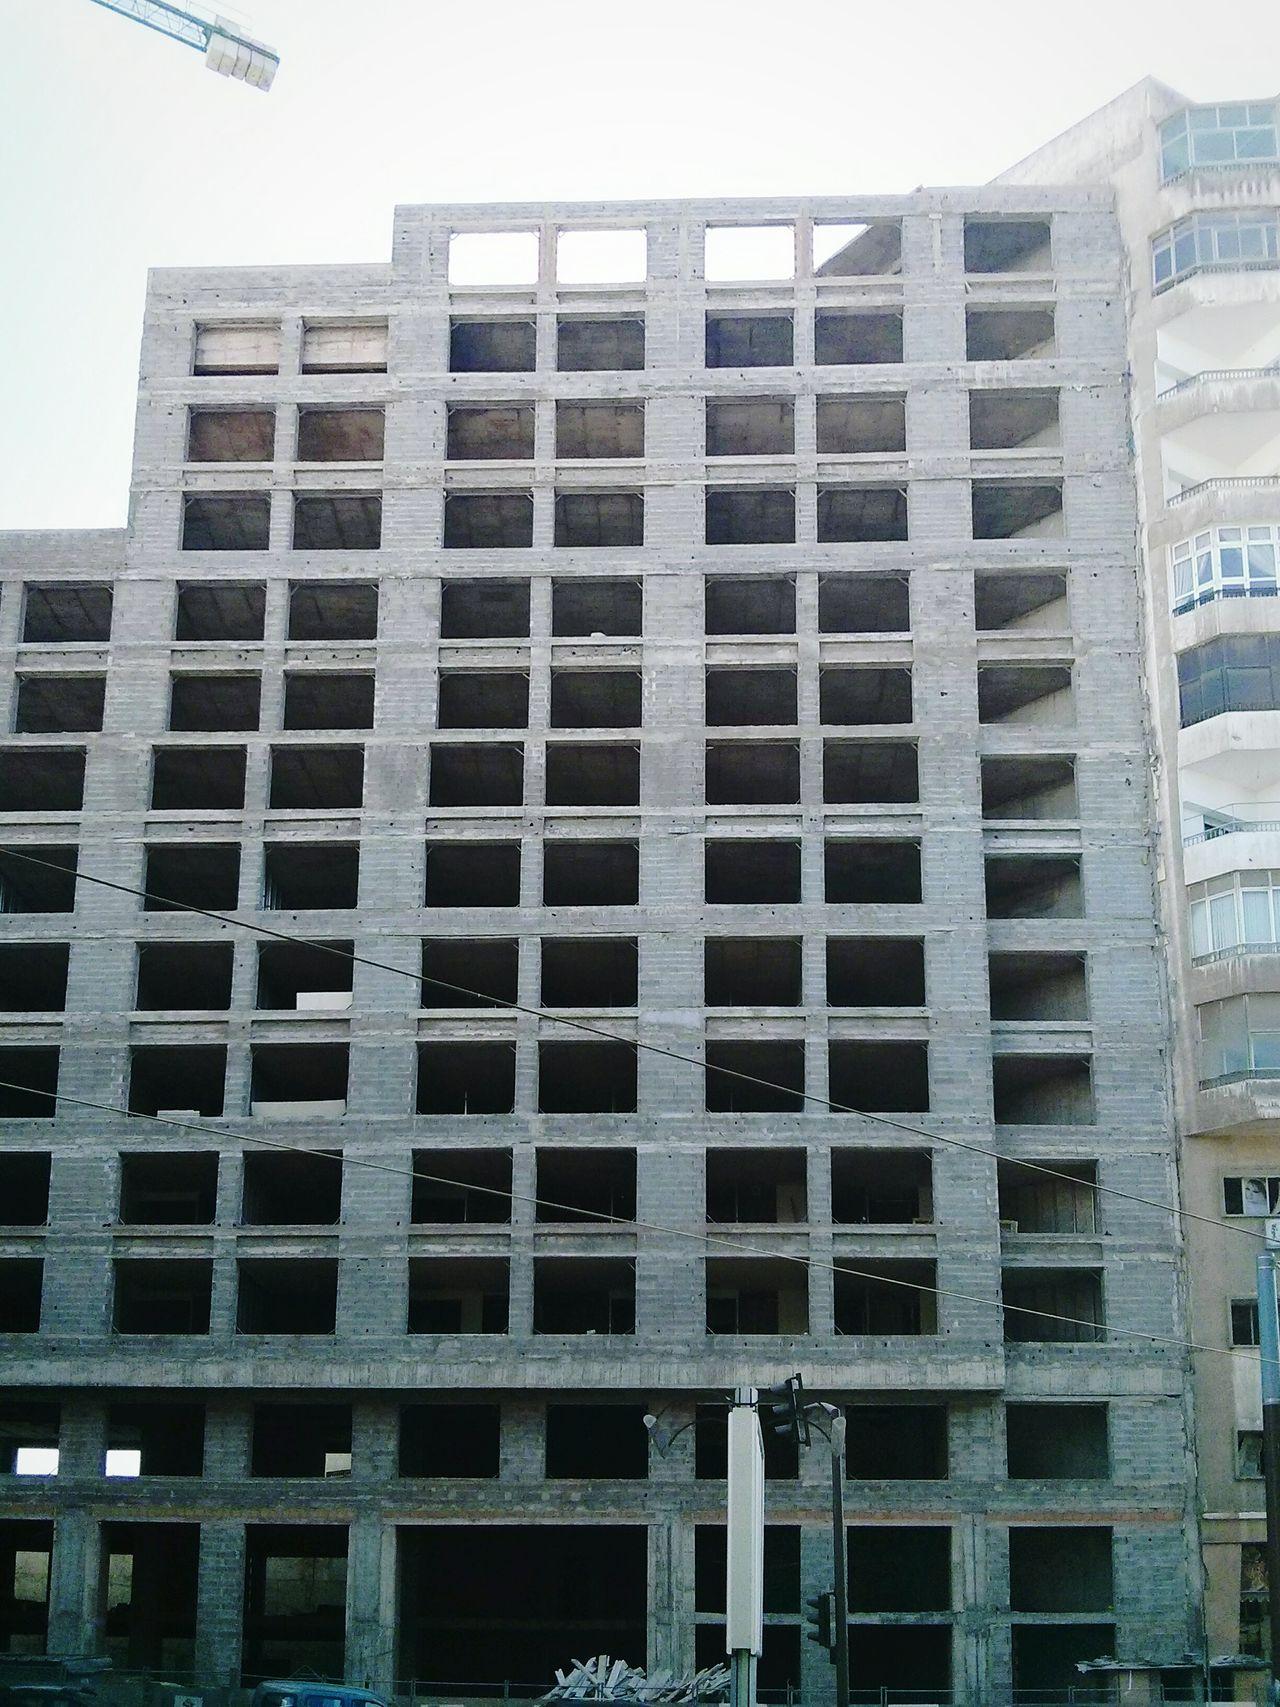 Concrete Jungle Urban Geometry Under Construction Architecture